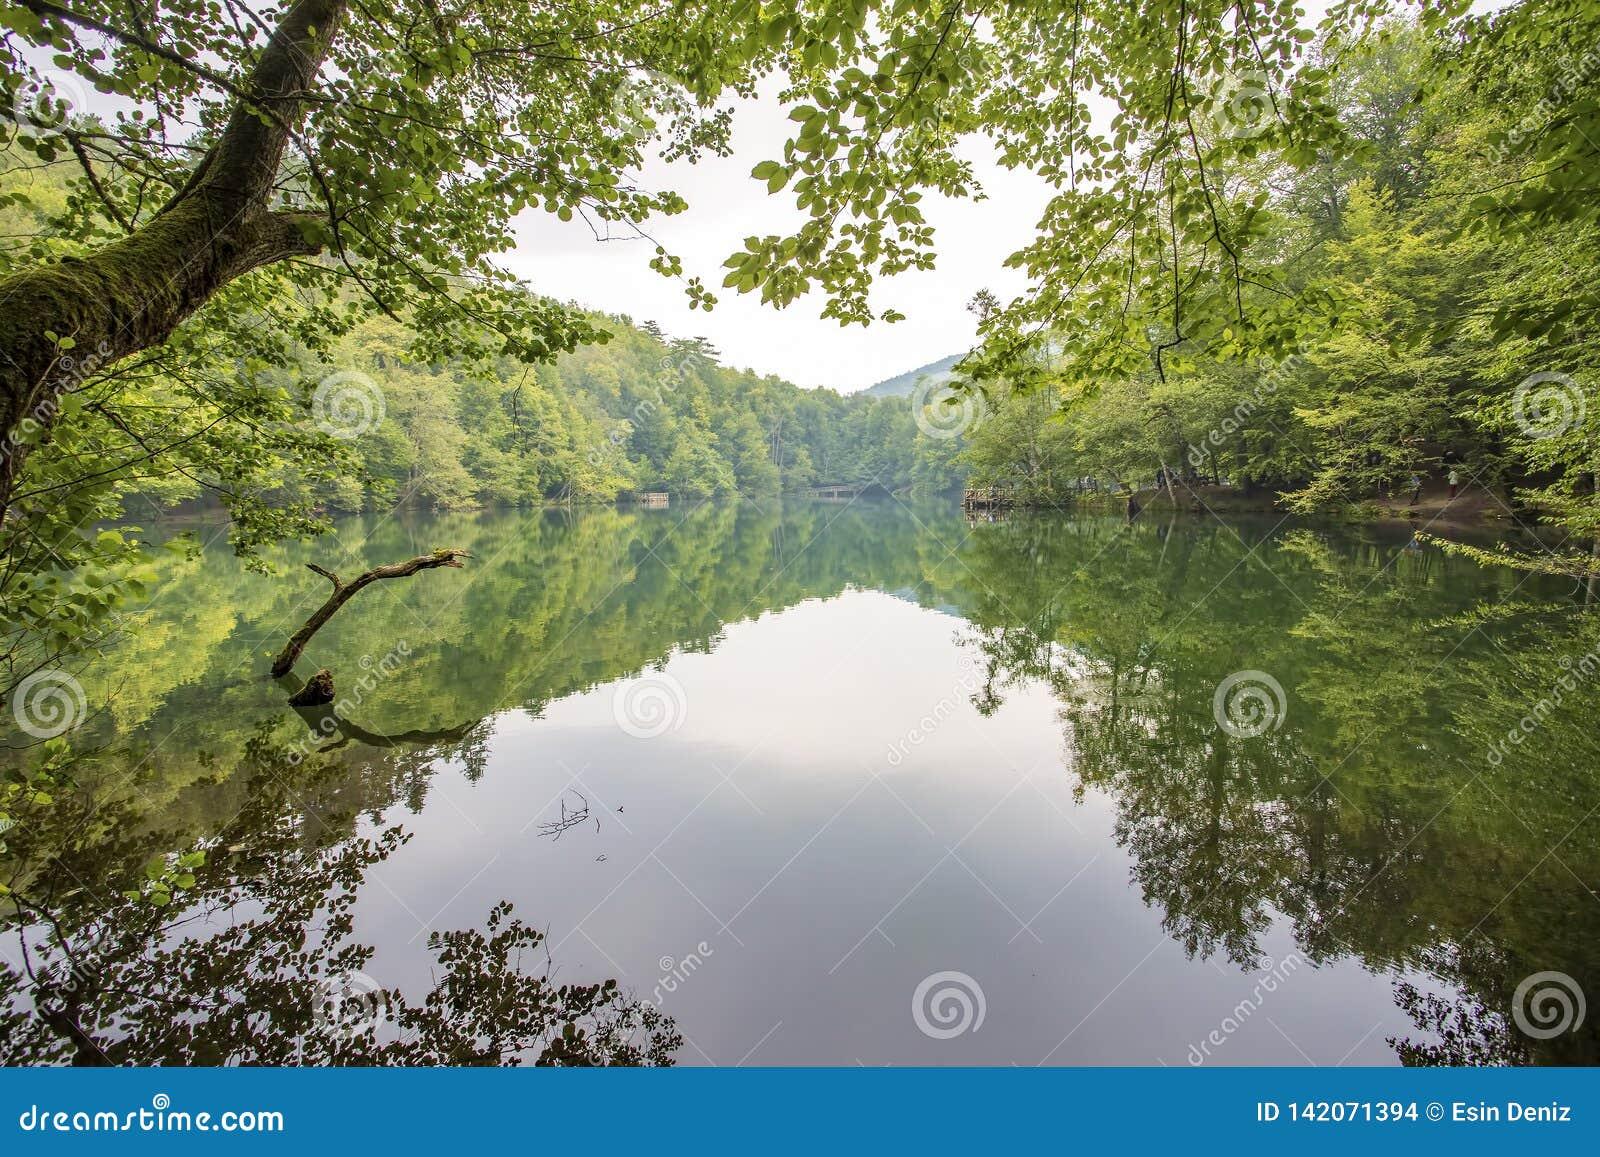 Yedigoller / Bolu / Turkey, summer season, forest landscape